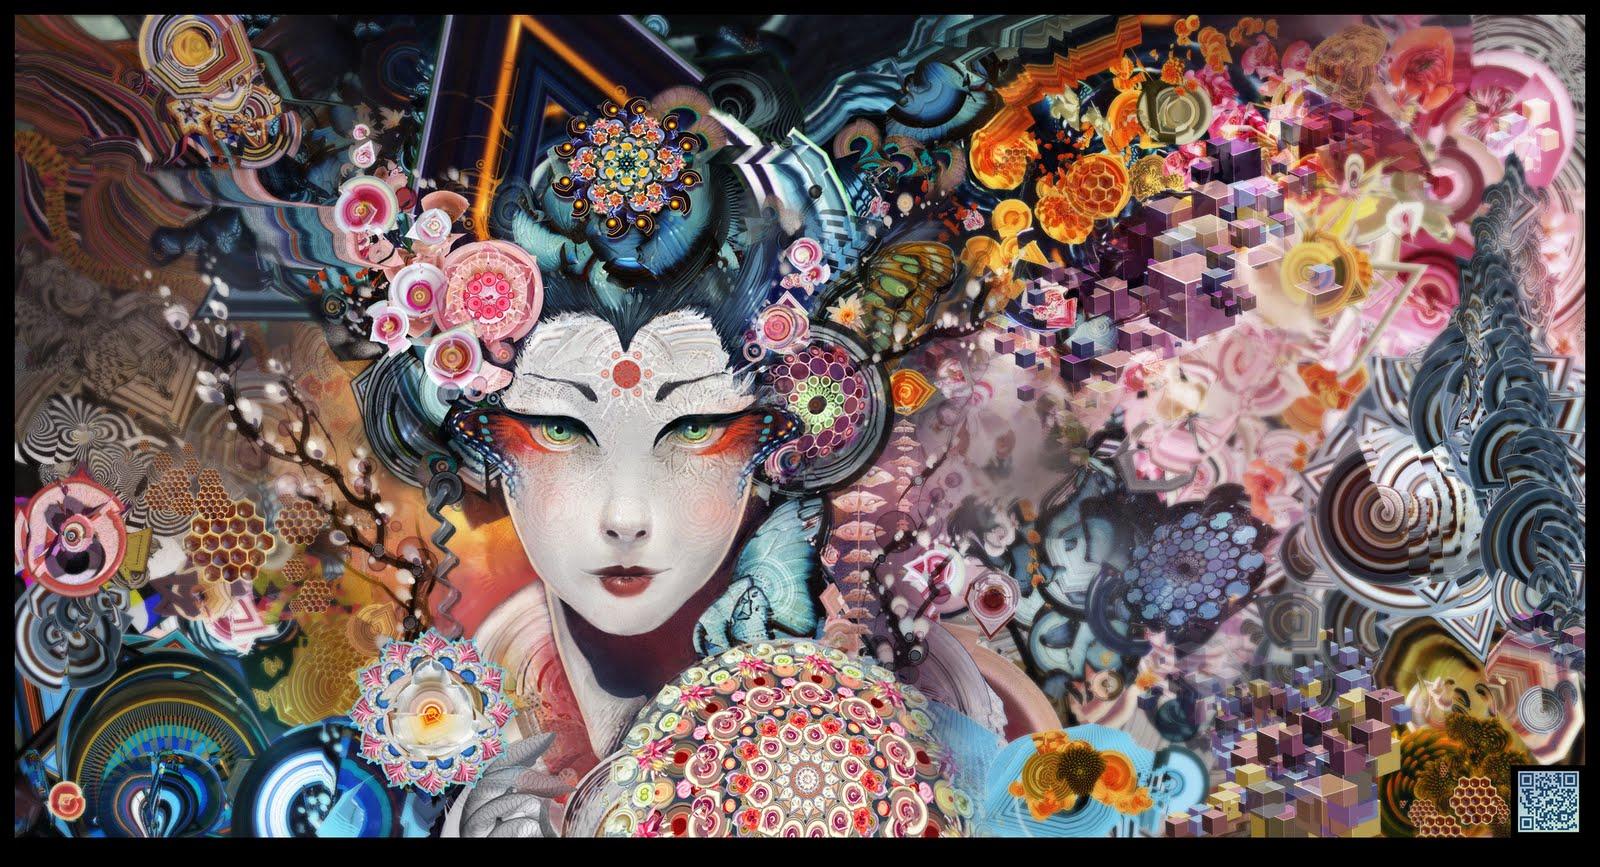 geisha wallpaper geisha wallpaper geisha illustration wallpaper geisha 1600x867